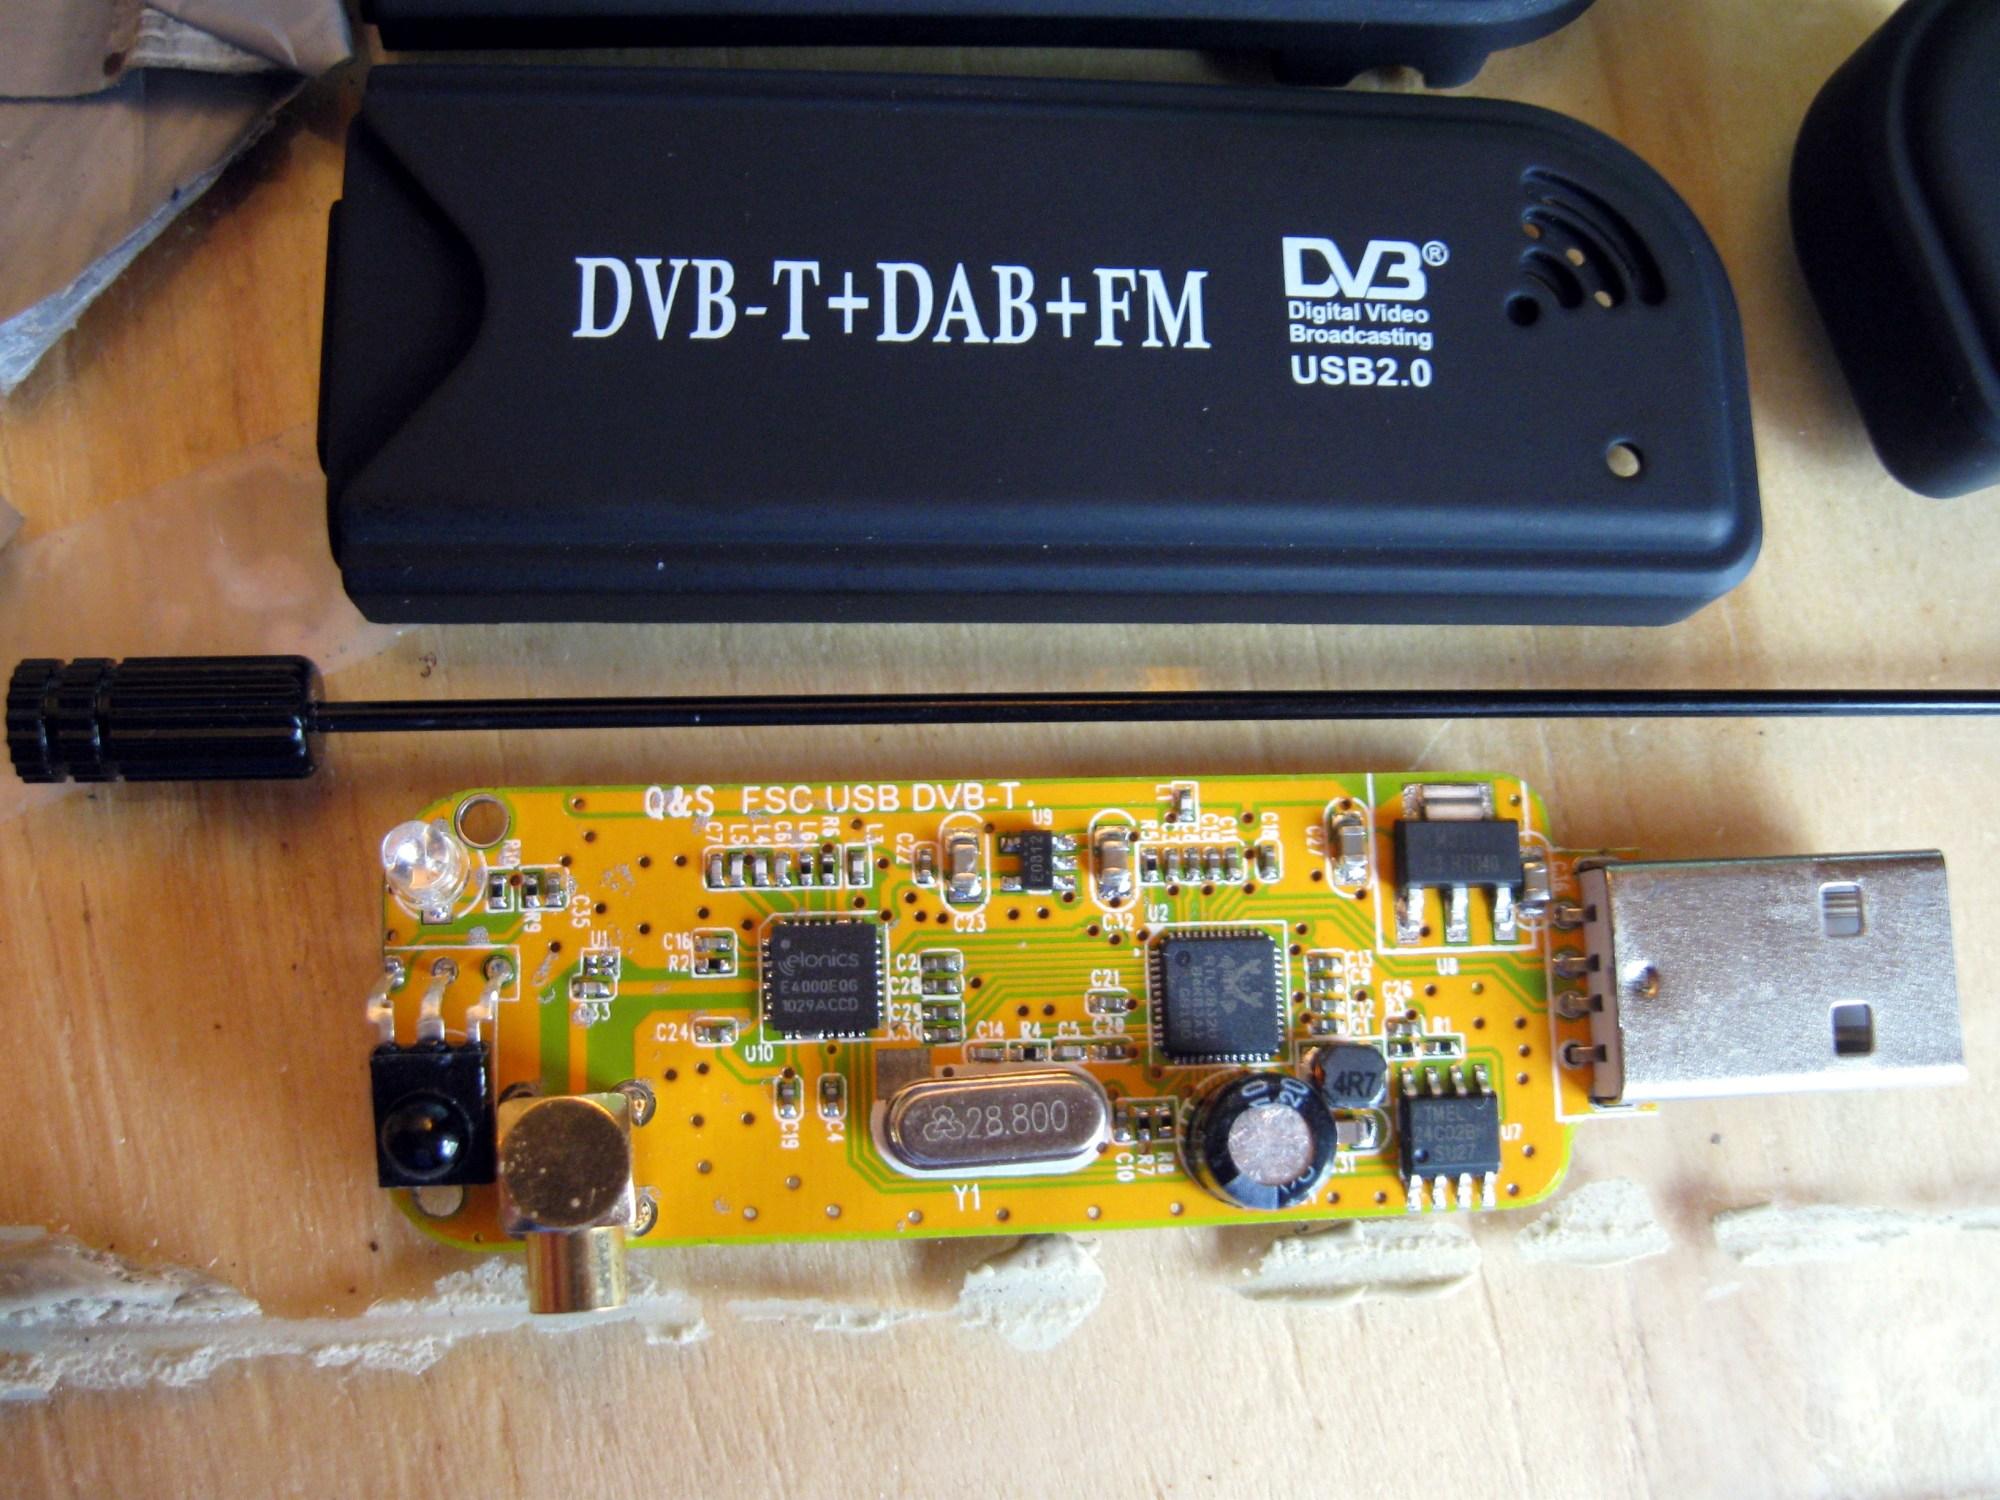 hight resolution of rtl sdr and gnu radio with realtek rtl2832u elonics e4000 raphael micro r820t software defined radio receivers